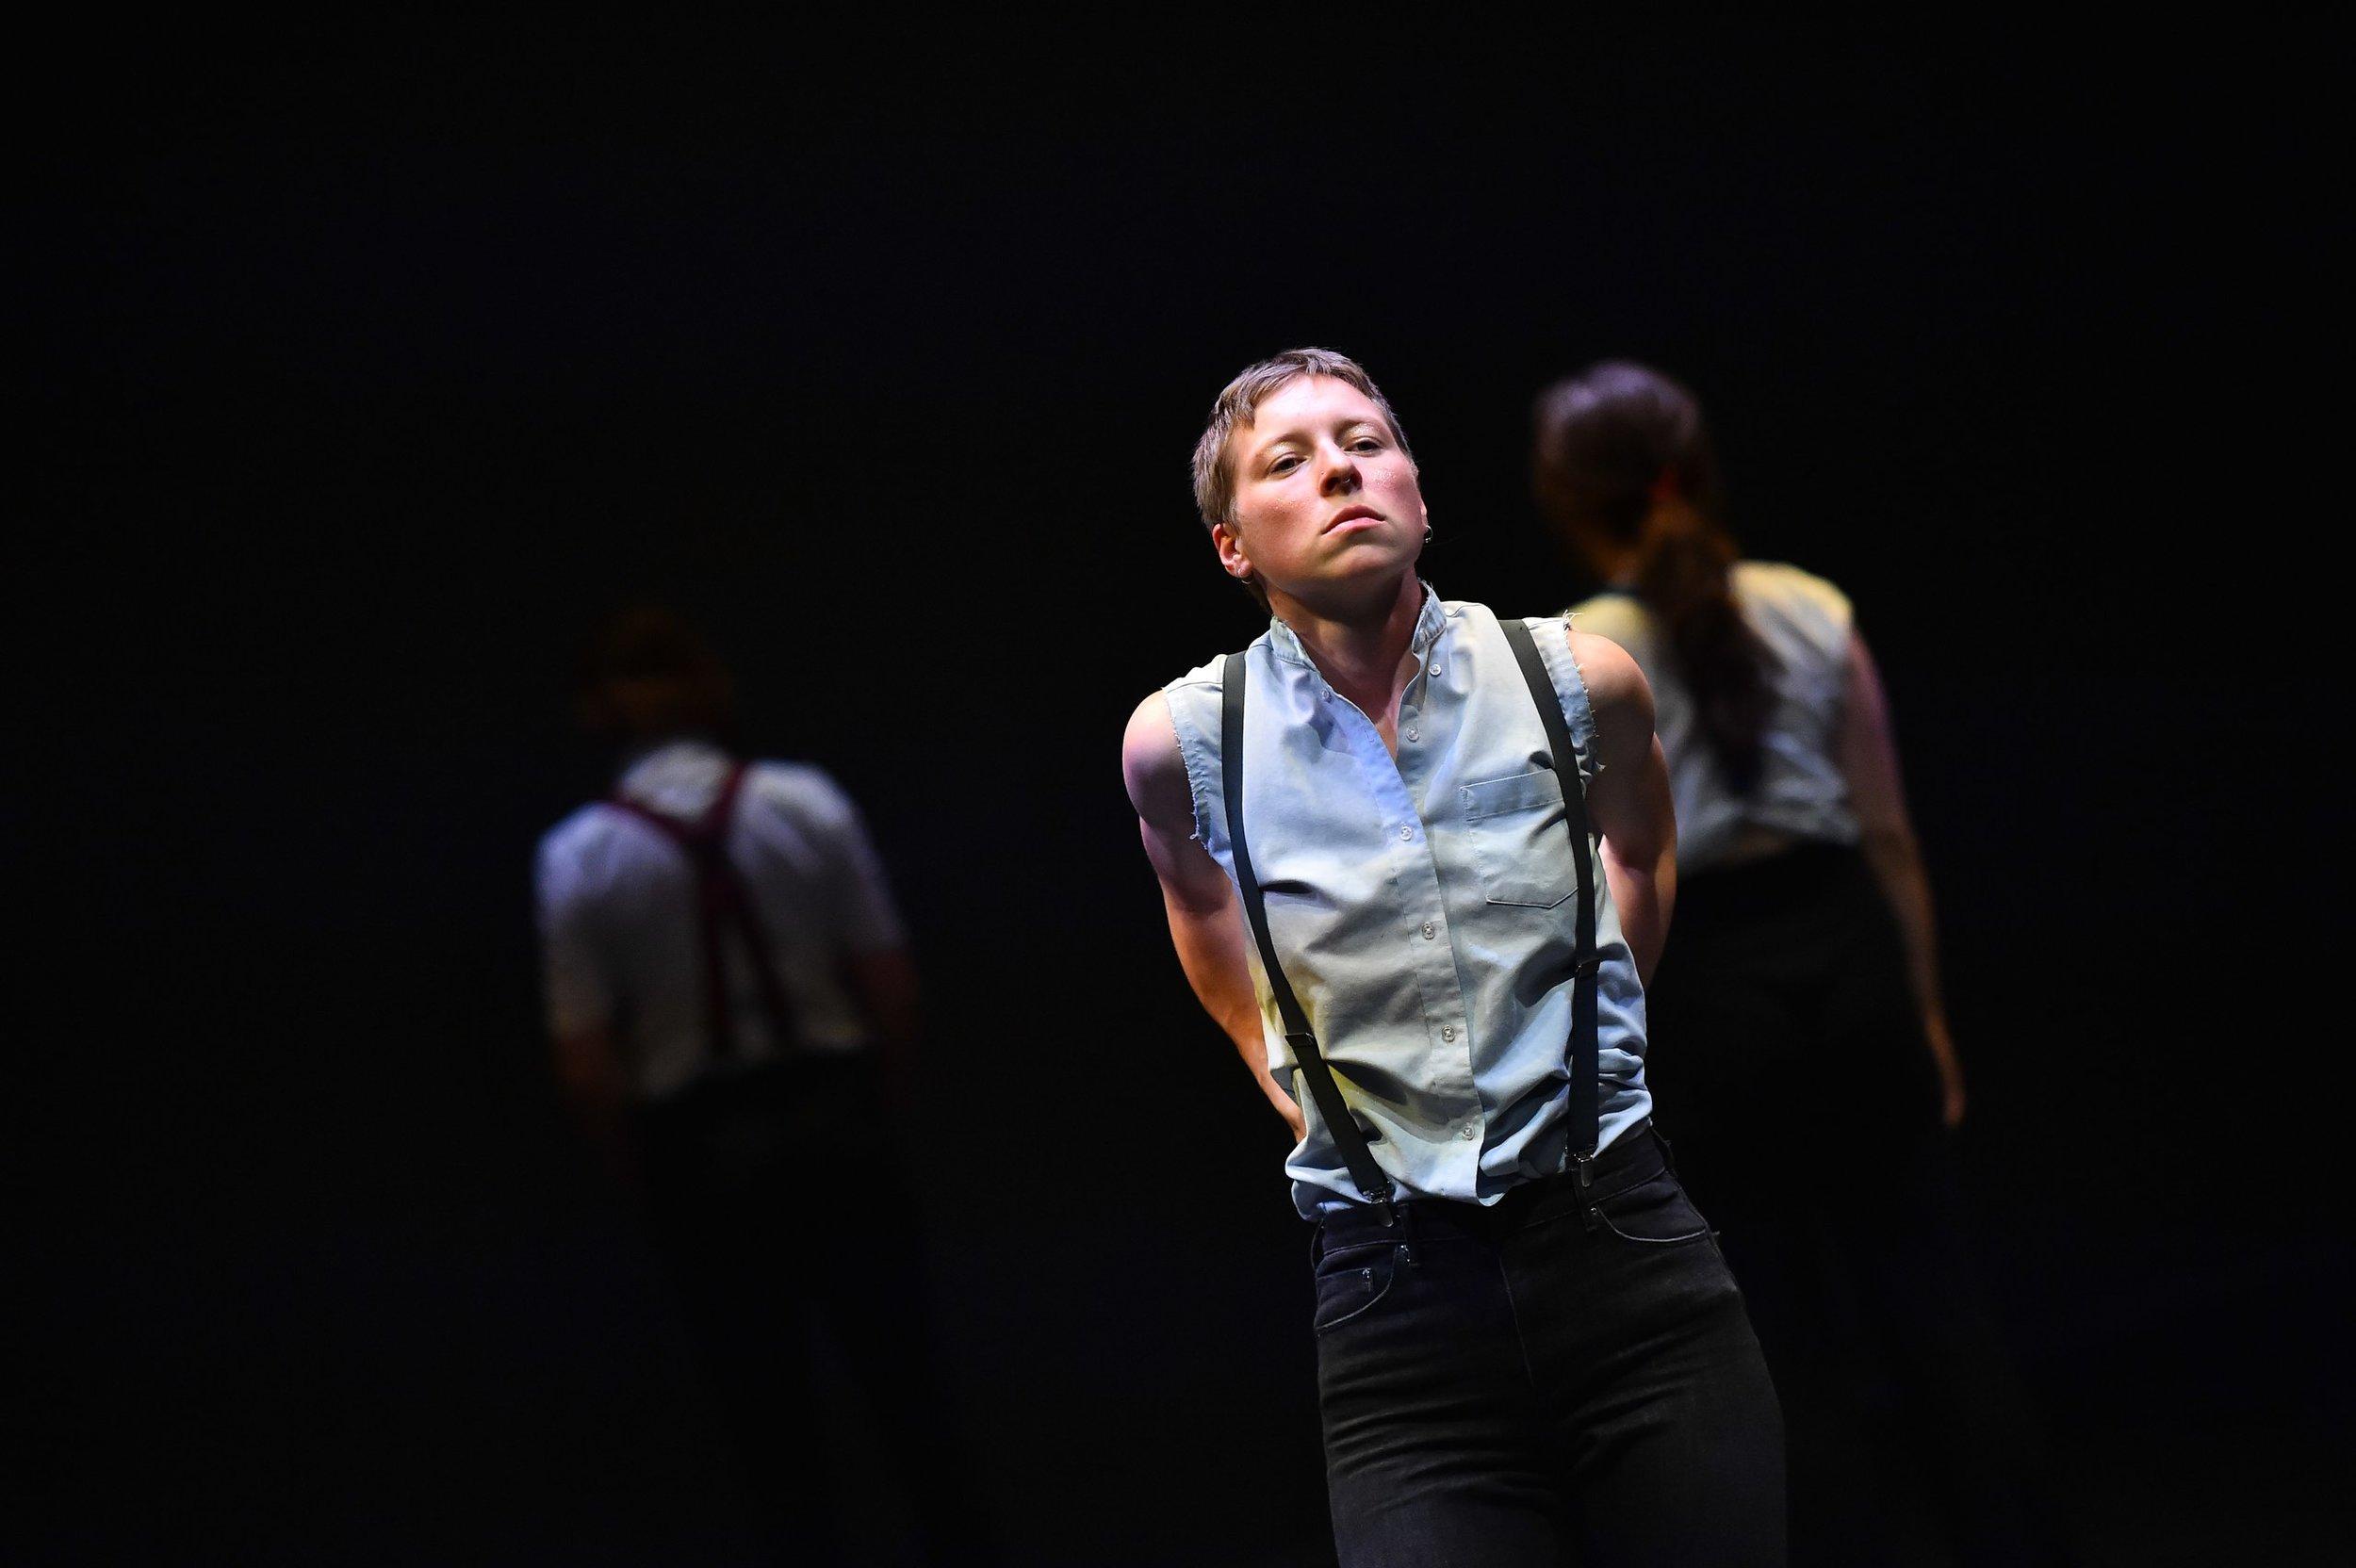 """Go On, Refuse Me."" Dance-theater performance. July 2017, Joe Goode Annex, San Francisco, CA, USA."